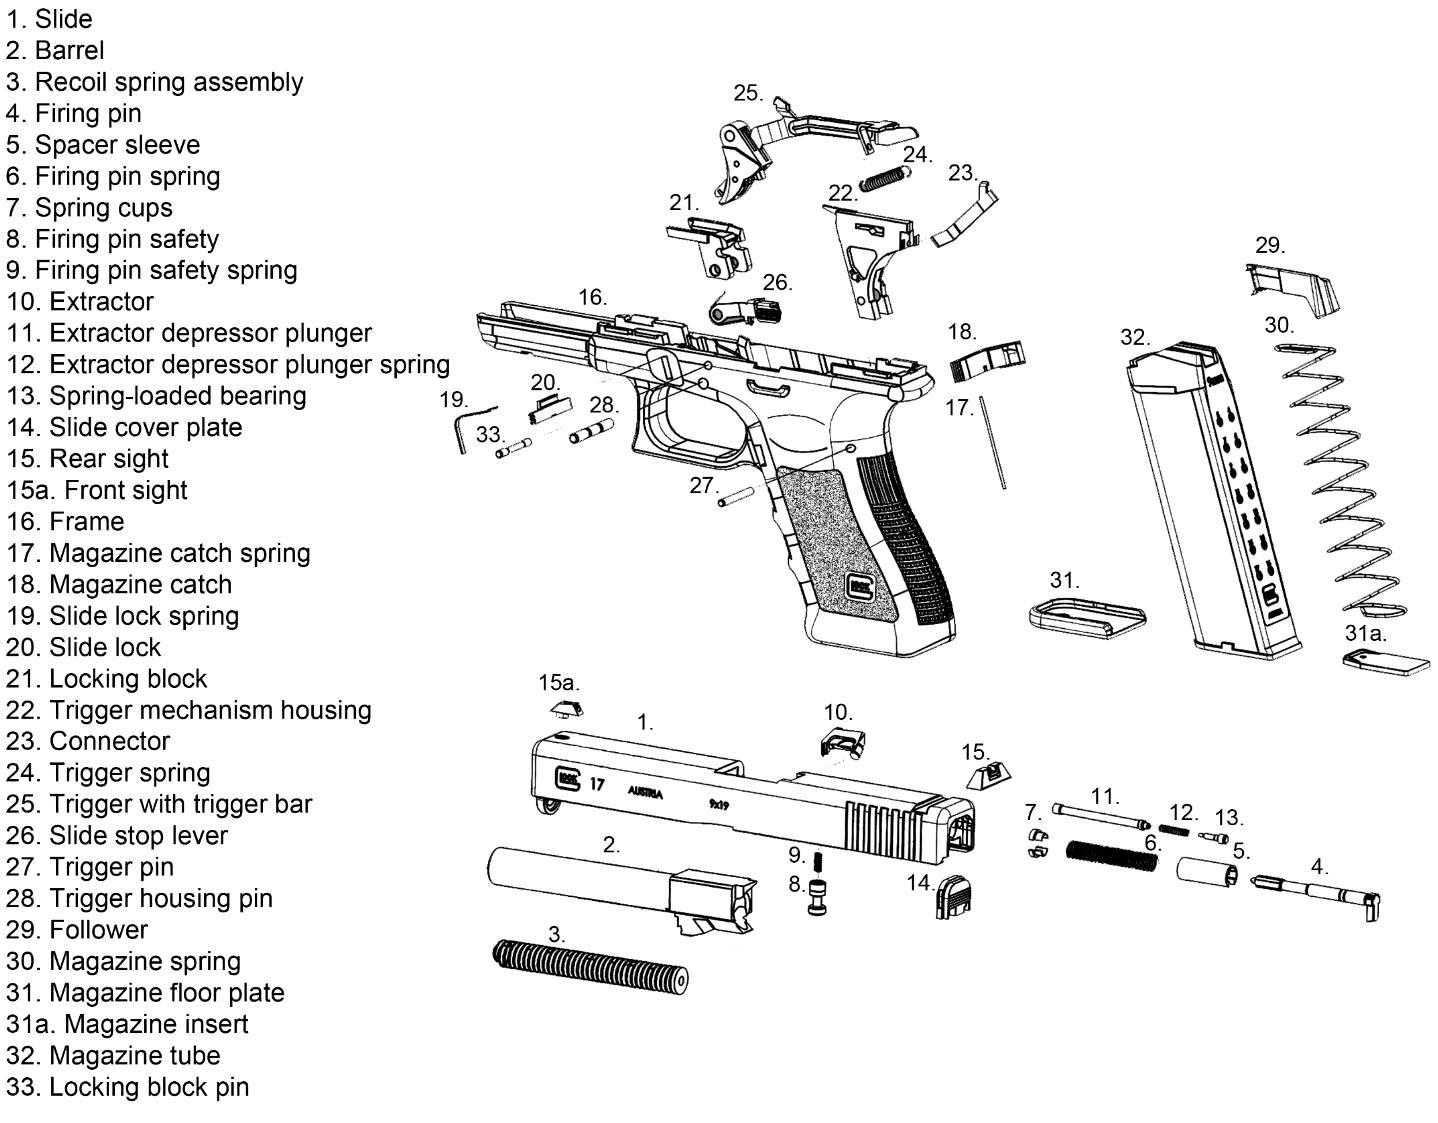 hight resolution of glock 17 exploded diagram firearms glock 22 guns firearms glock 17 frame parts diagram glock 17 nomenclature diagram